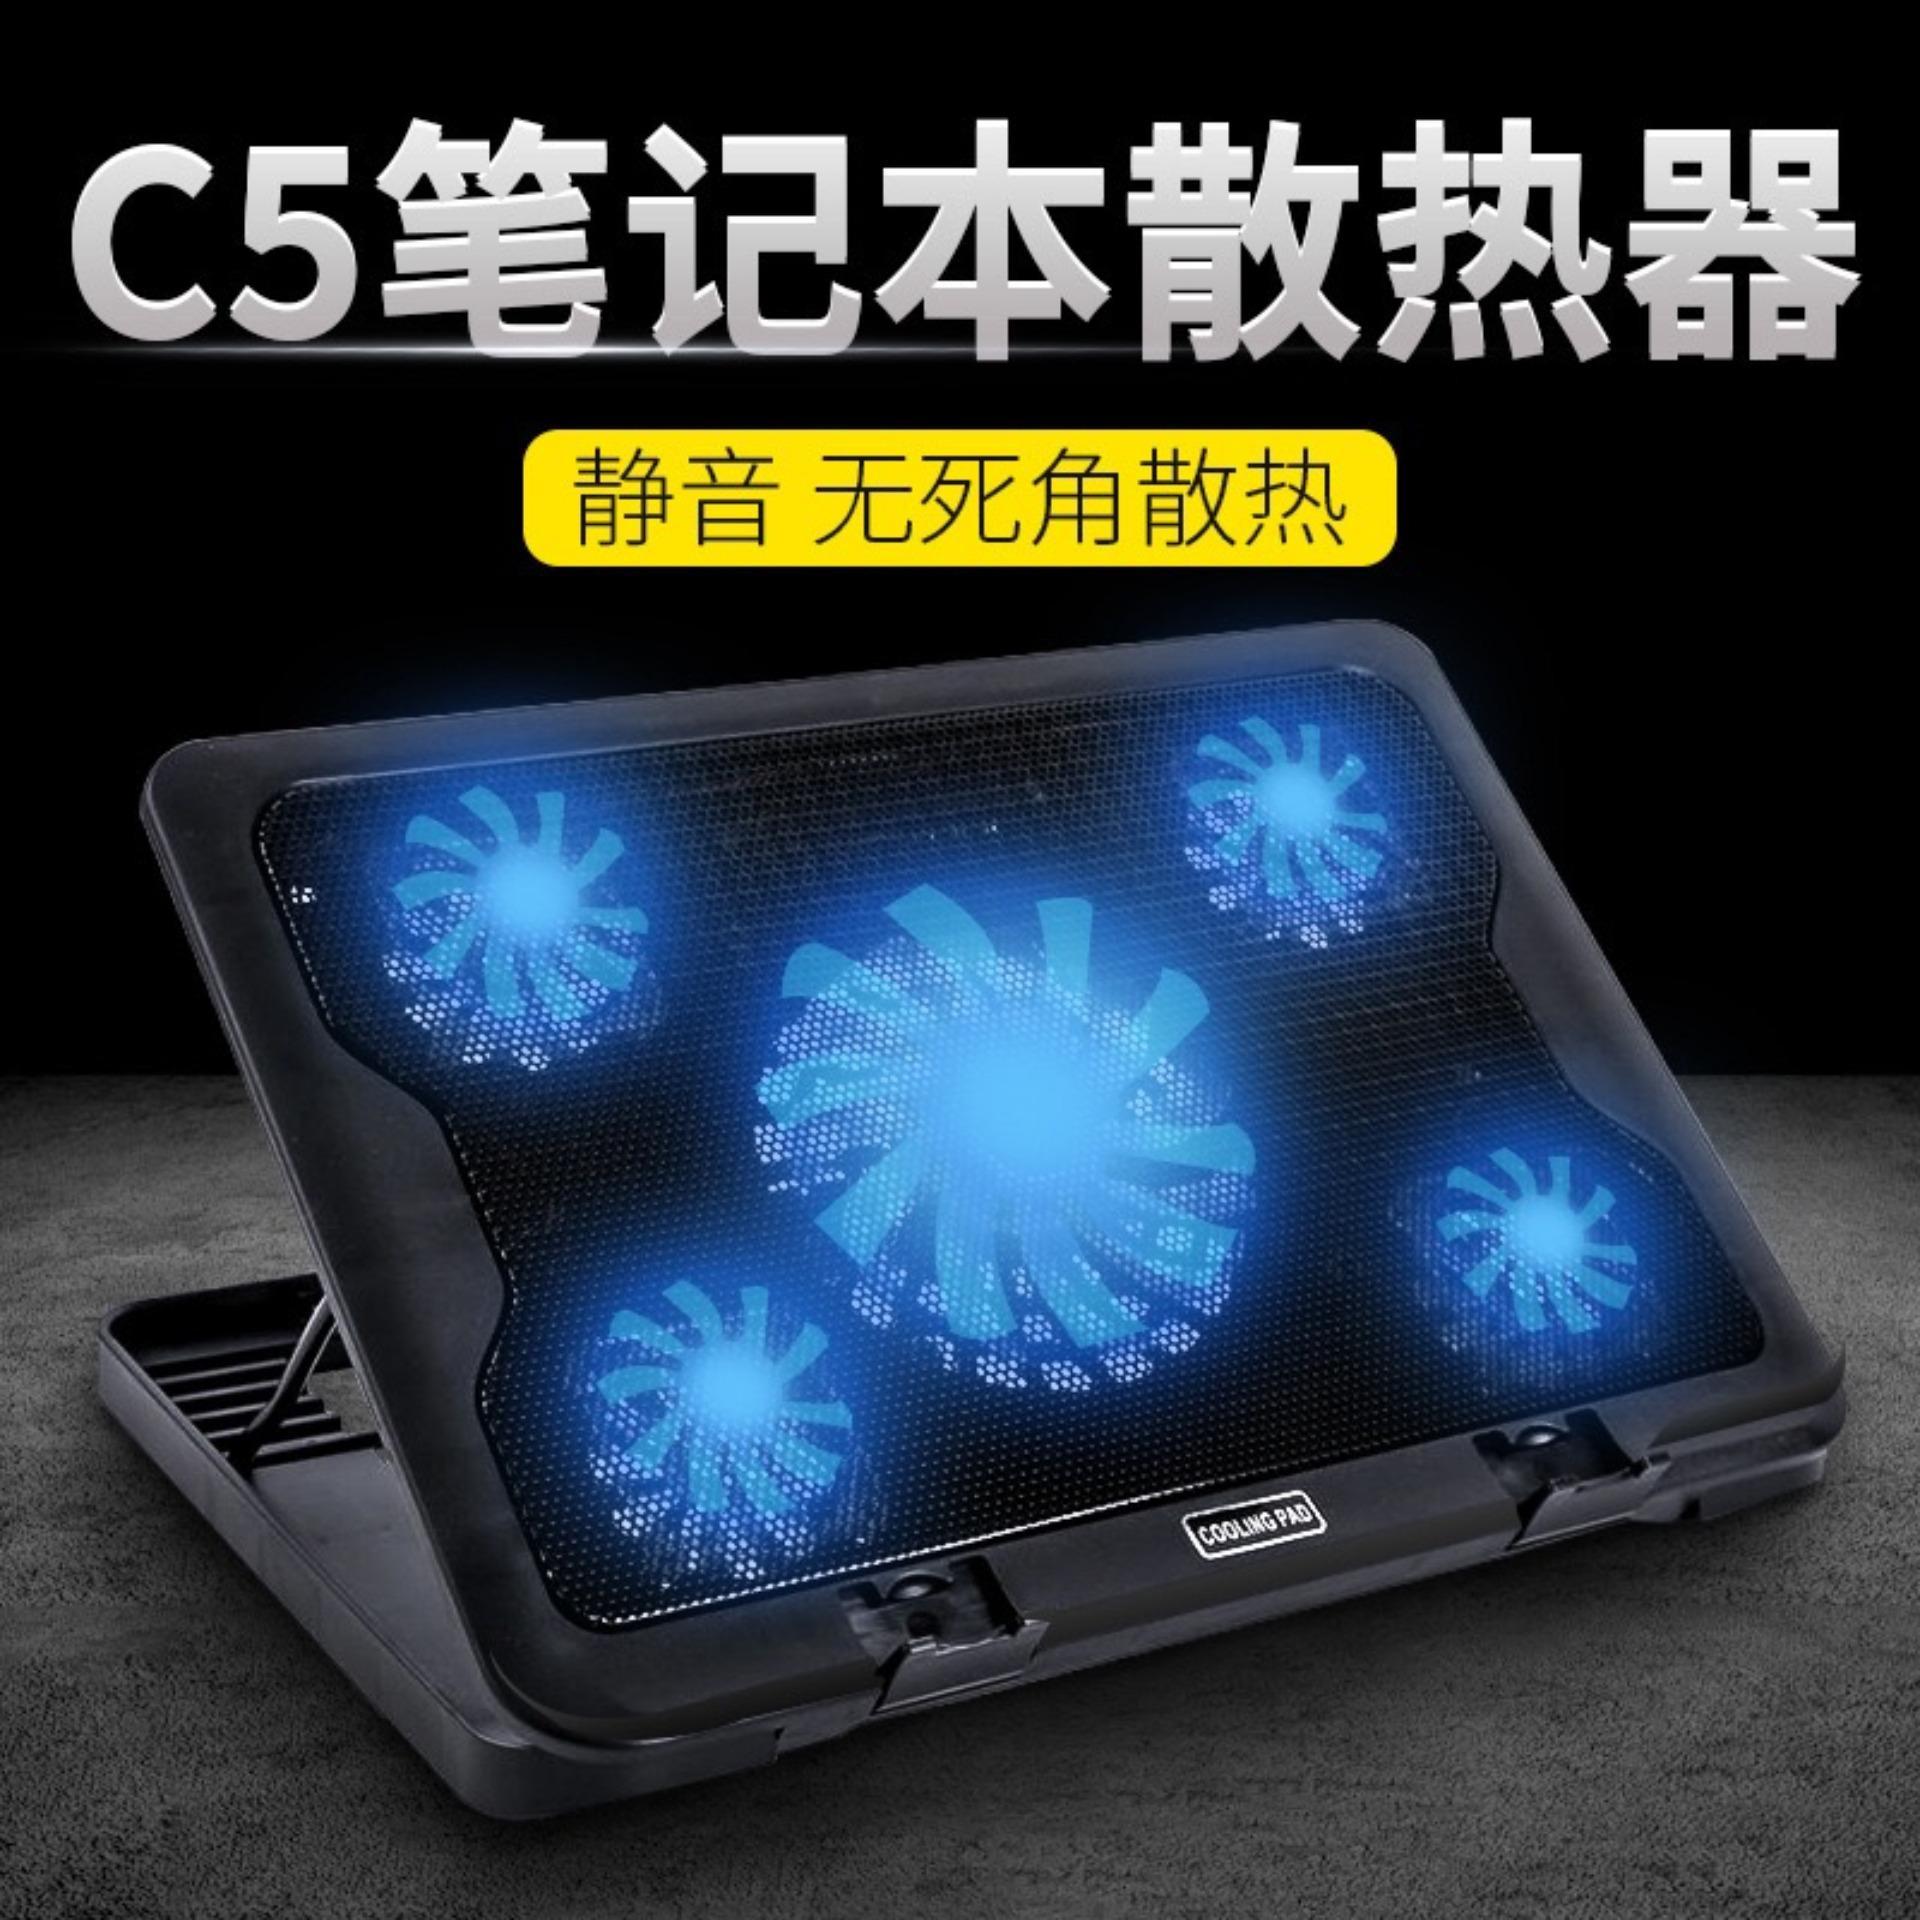 Bandingkan Toko Unique Cooling Pad Kipas Pendingin Laptop Cooler 5 Universal Fan Syc5 Hitam